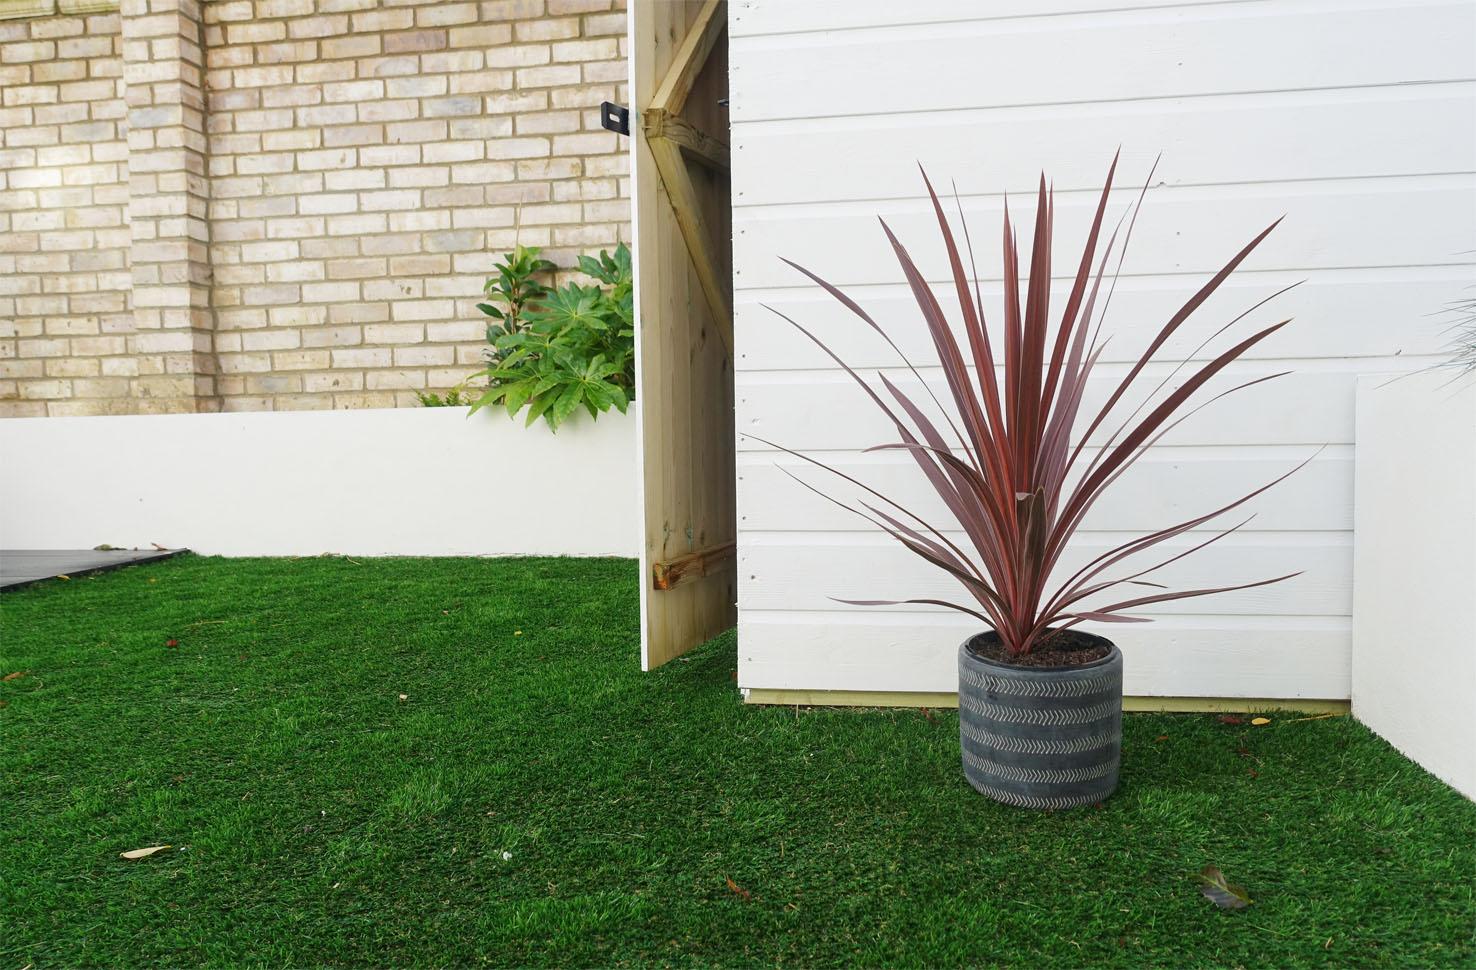 tashsouth.com Sandtex paints Clay White Chalk Hill